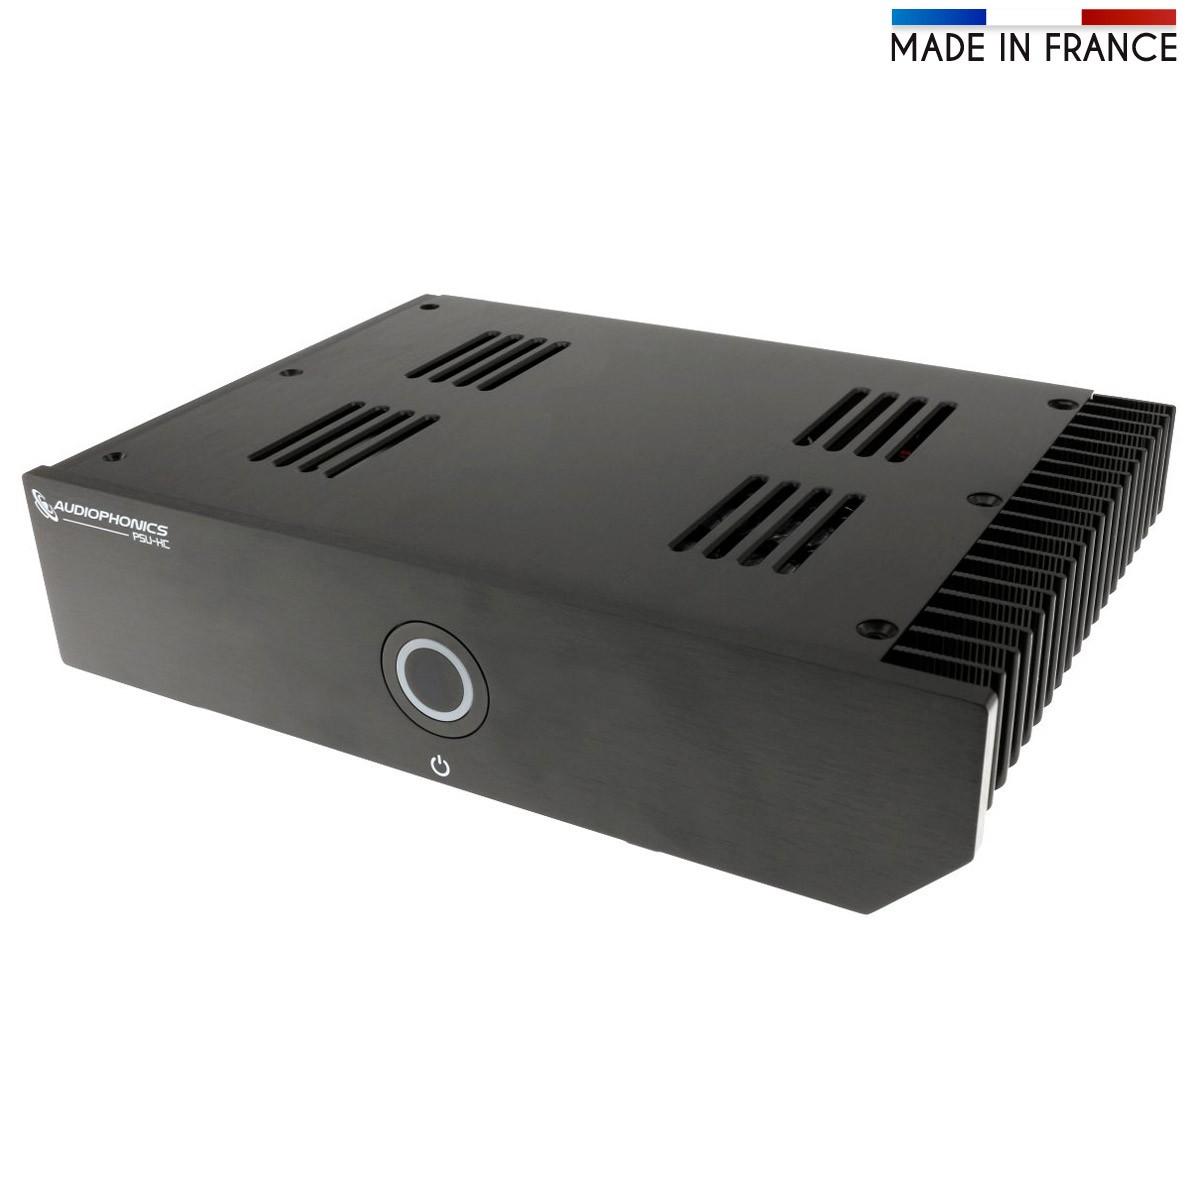 AUDIOPHONICS PSU-HC Alimentation Linéaire régulée ifi Audio Pro iCAN 15V 5A 100VA